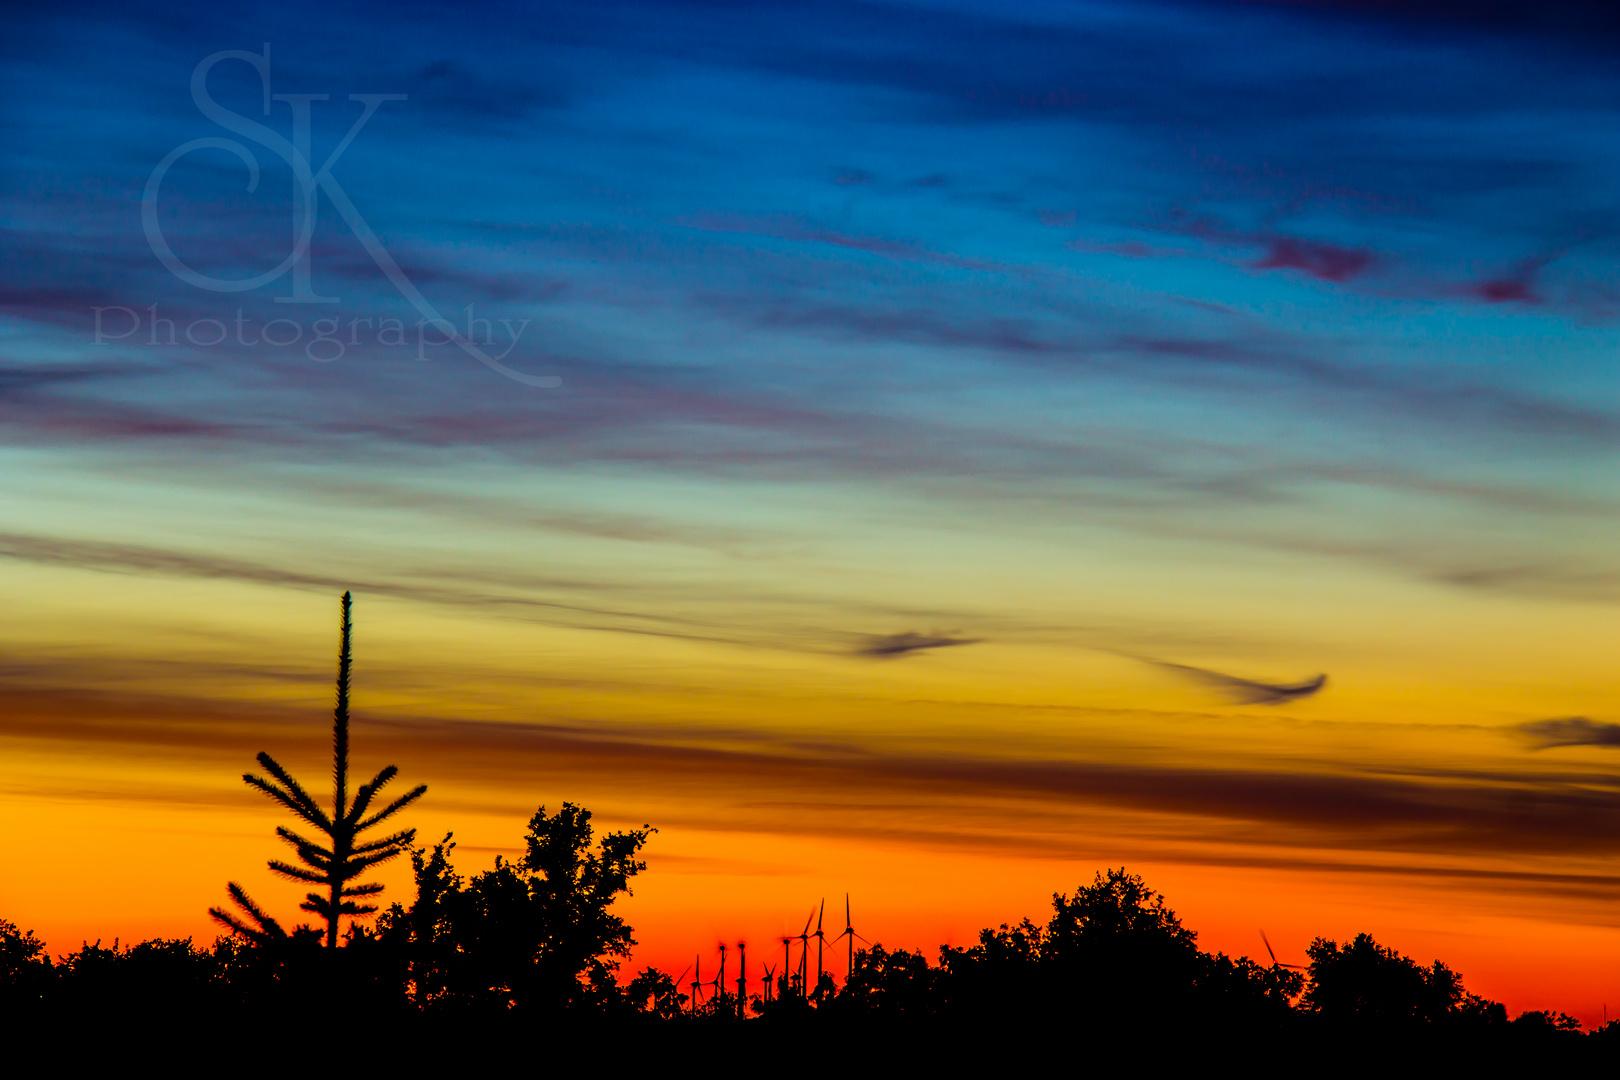 Sonnenuntergang vom 09.08.2013